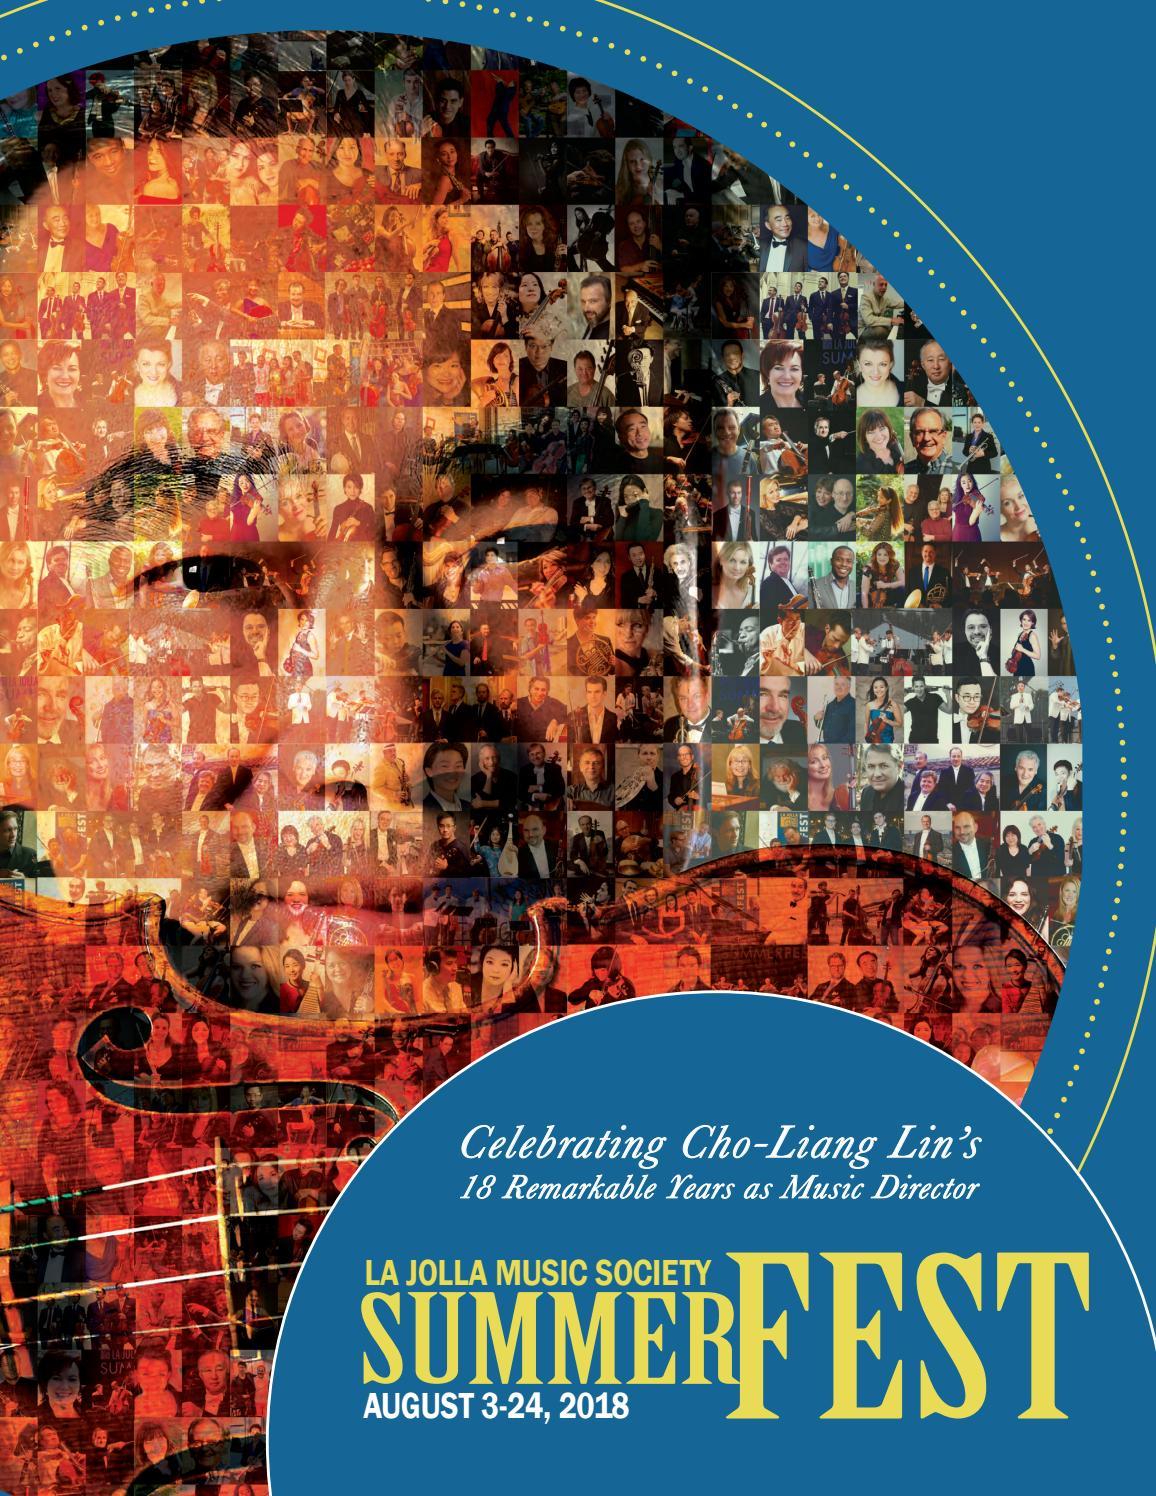 Piano De Cuisine Pas Cher summerfest 2018 program bookla jolla music society - issuu